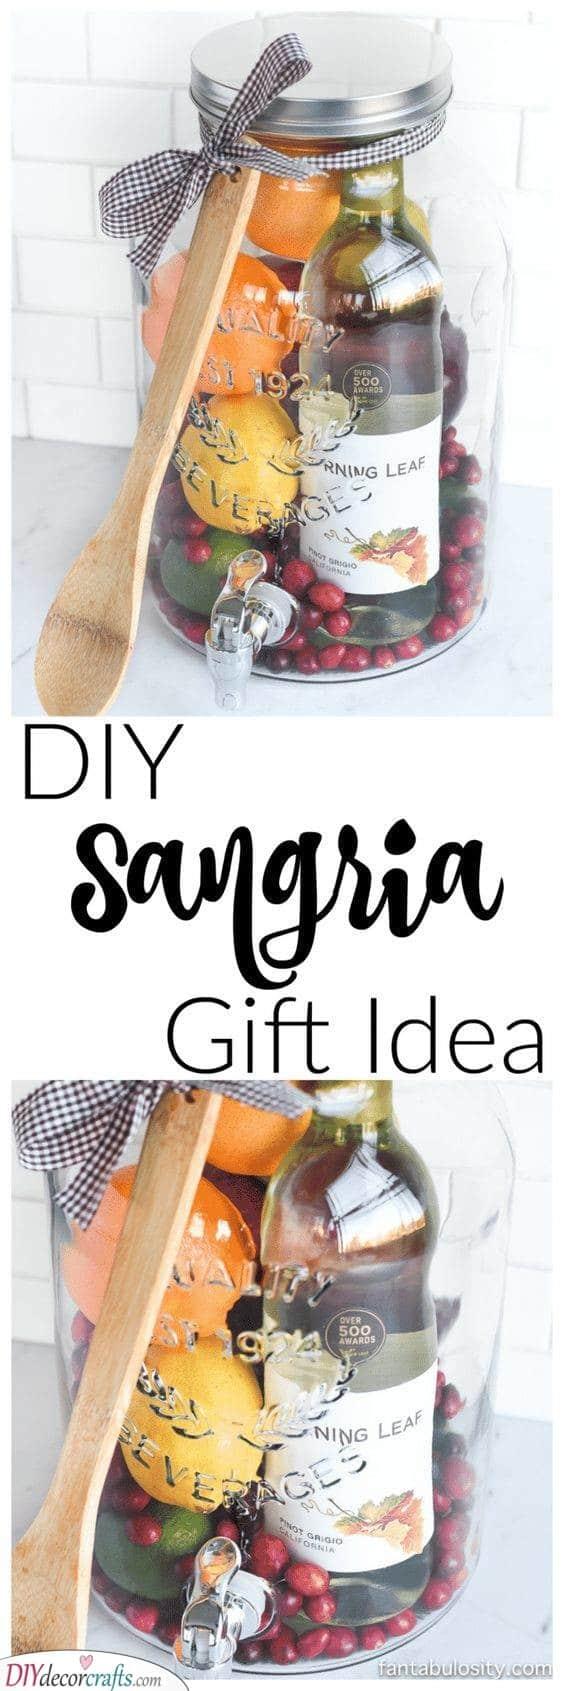 A Jar of Goodness - DIY Sangria